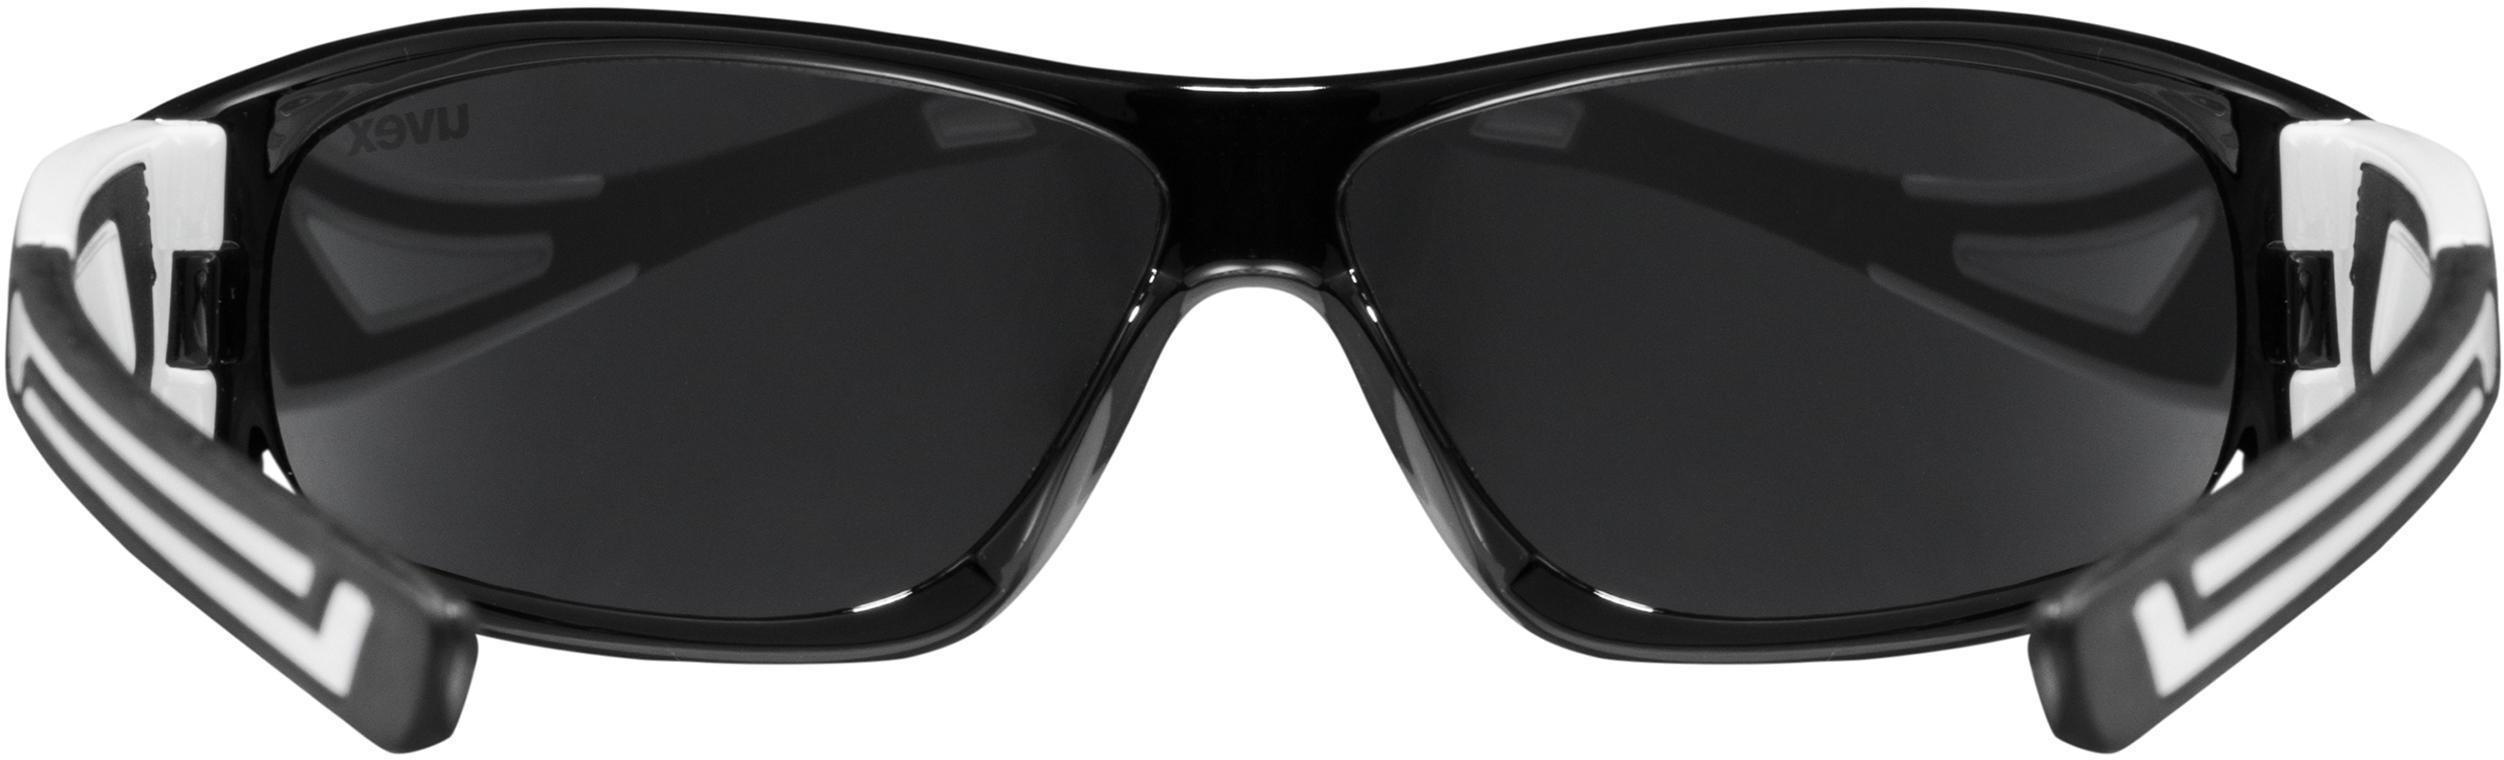 352c5f478f UVEX Sportstyle 509 - Gafas ciclismo Niños - blanco/negro   Bikester.es